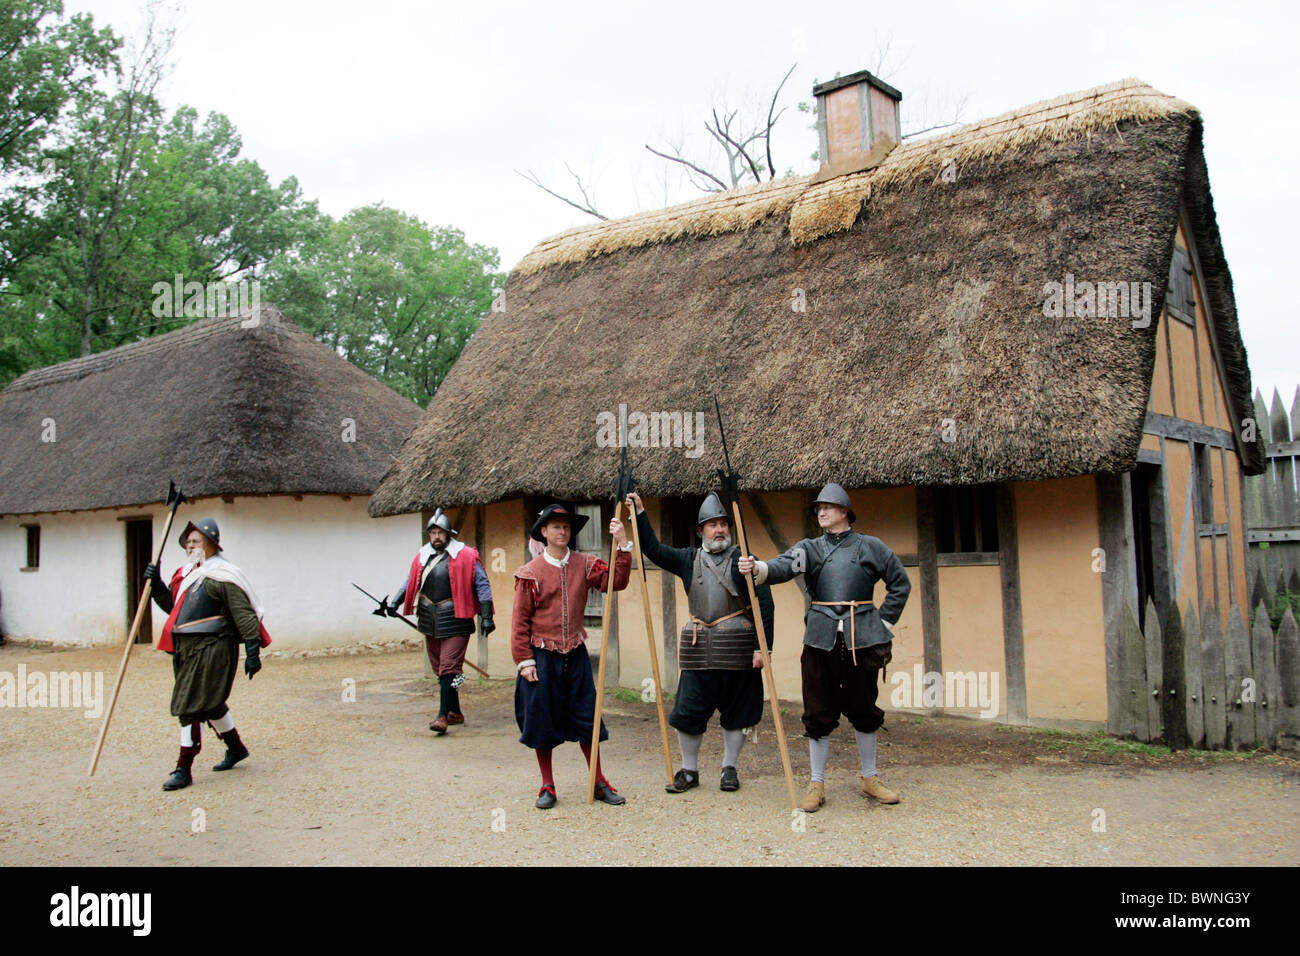 Men In Historic Costume At Jamestown Settlement Stock